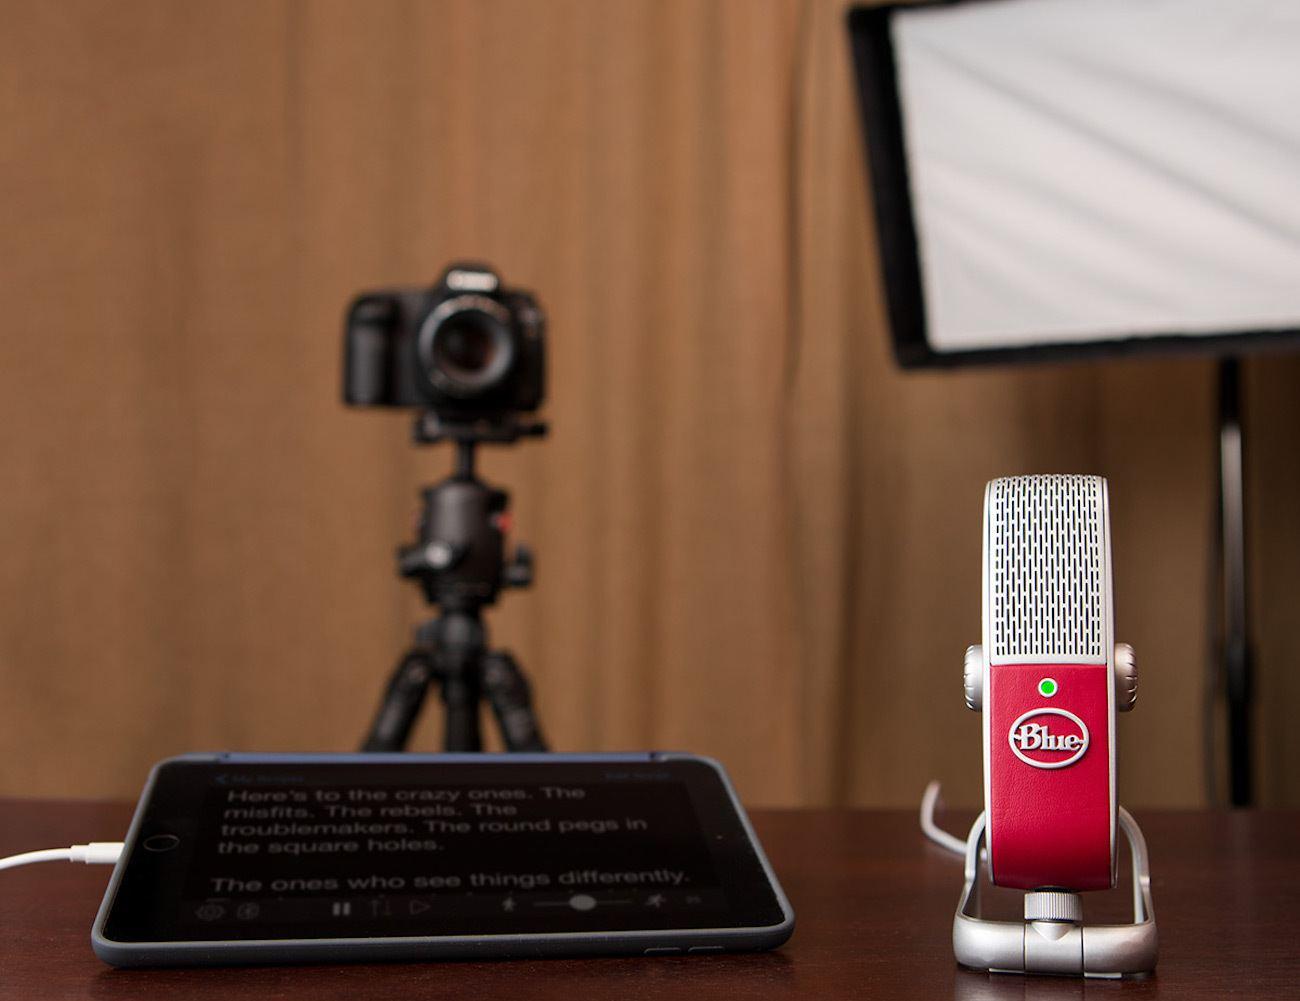 Blue Raspberry Premium USB Microphone